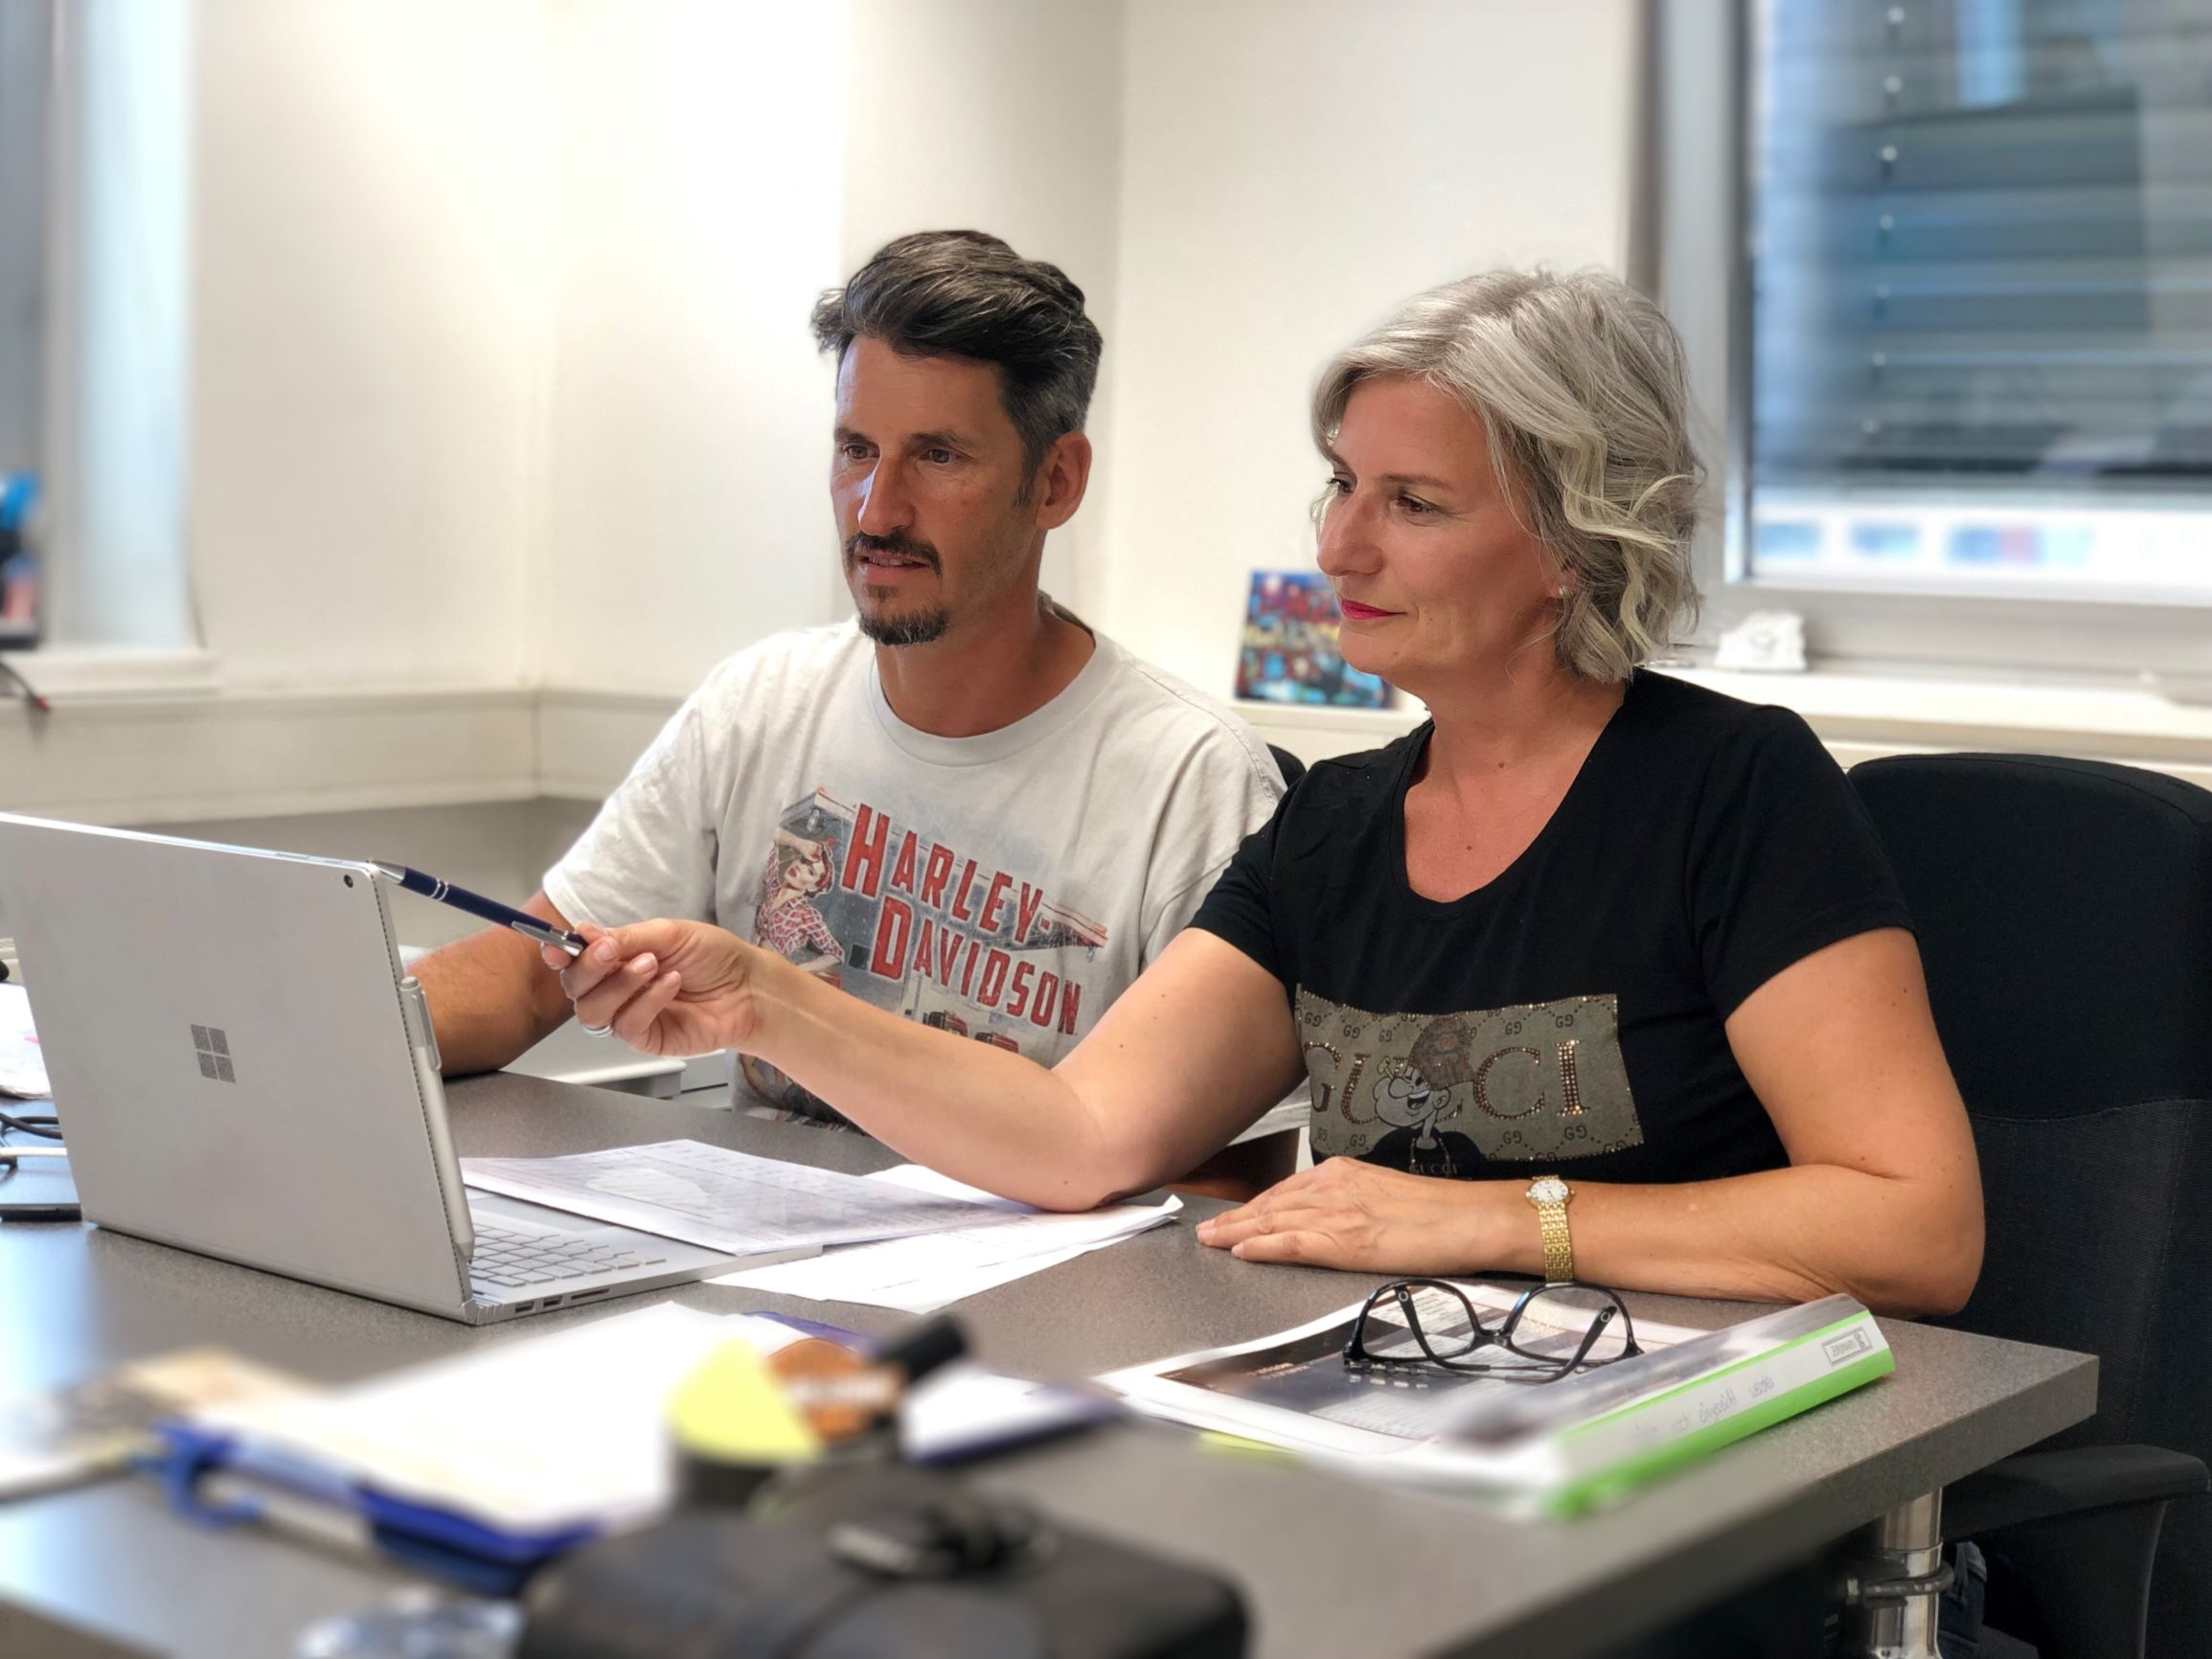 Unternehmensberatung bei Hot-Stuff Salzburg mit Sonja Promock